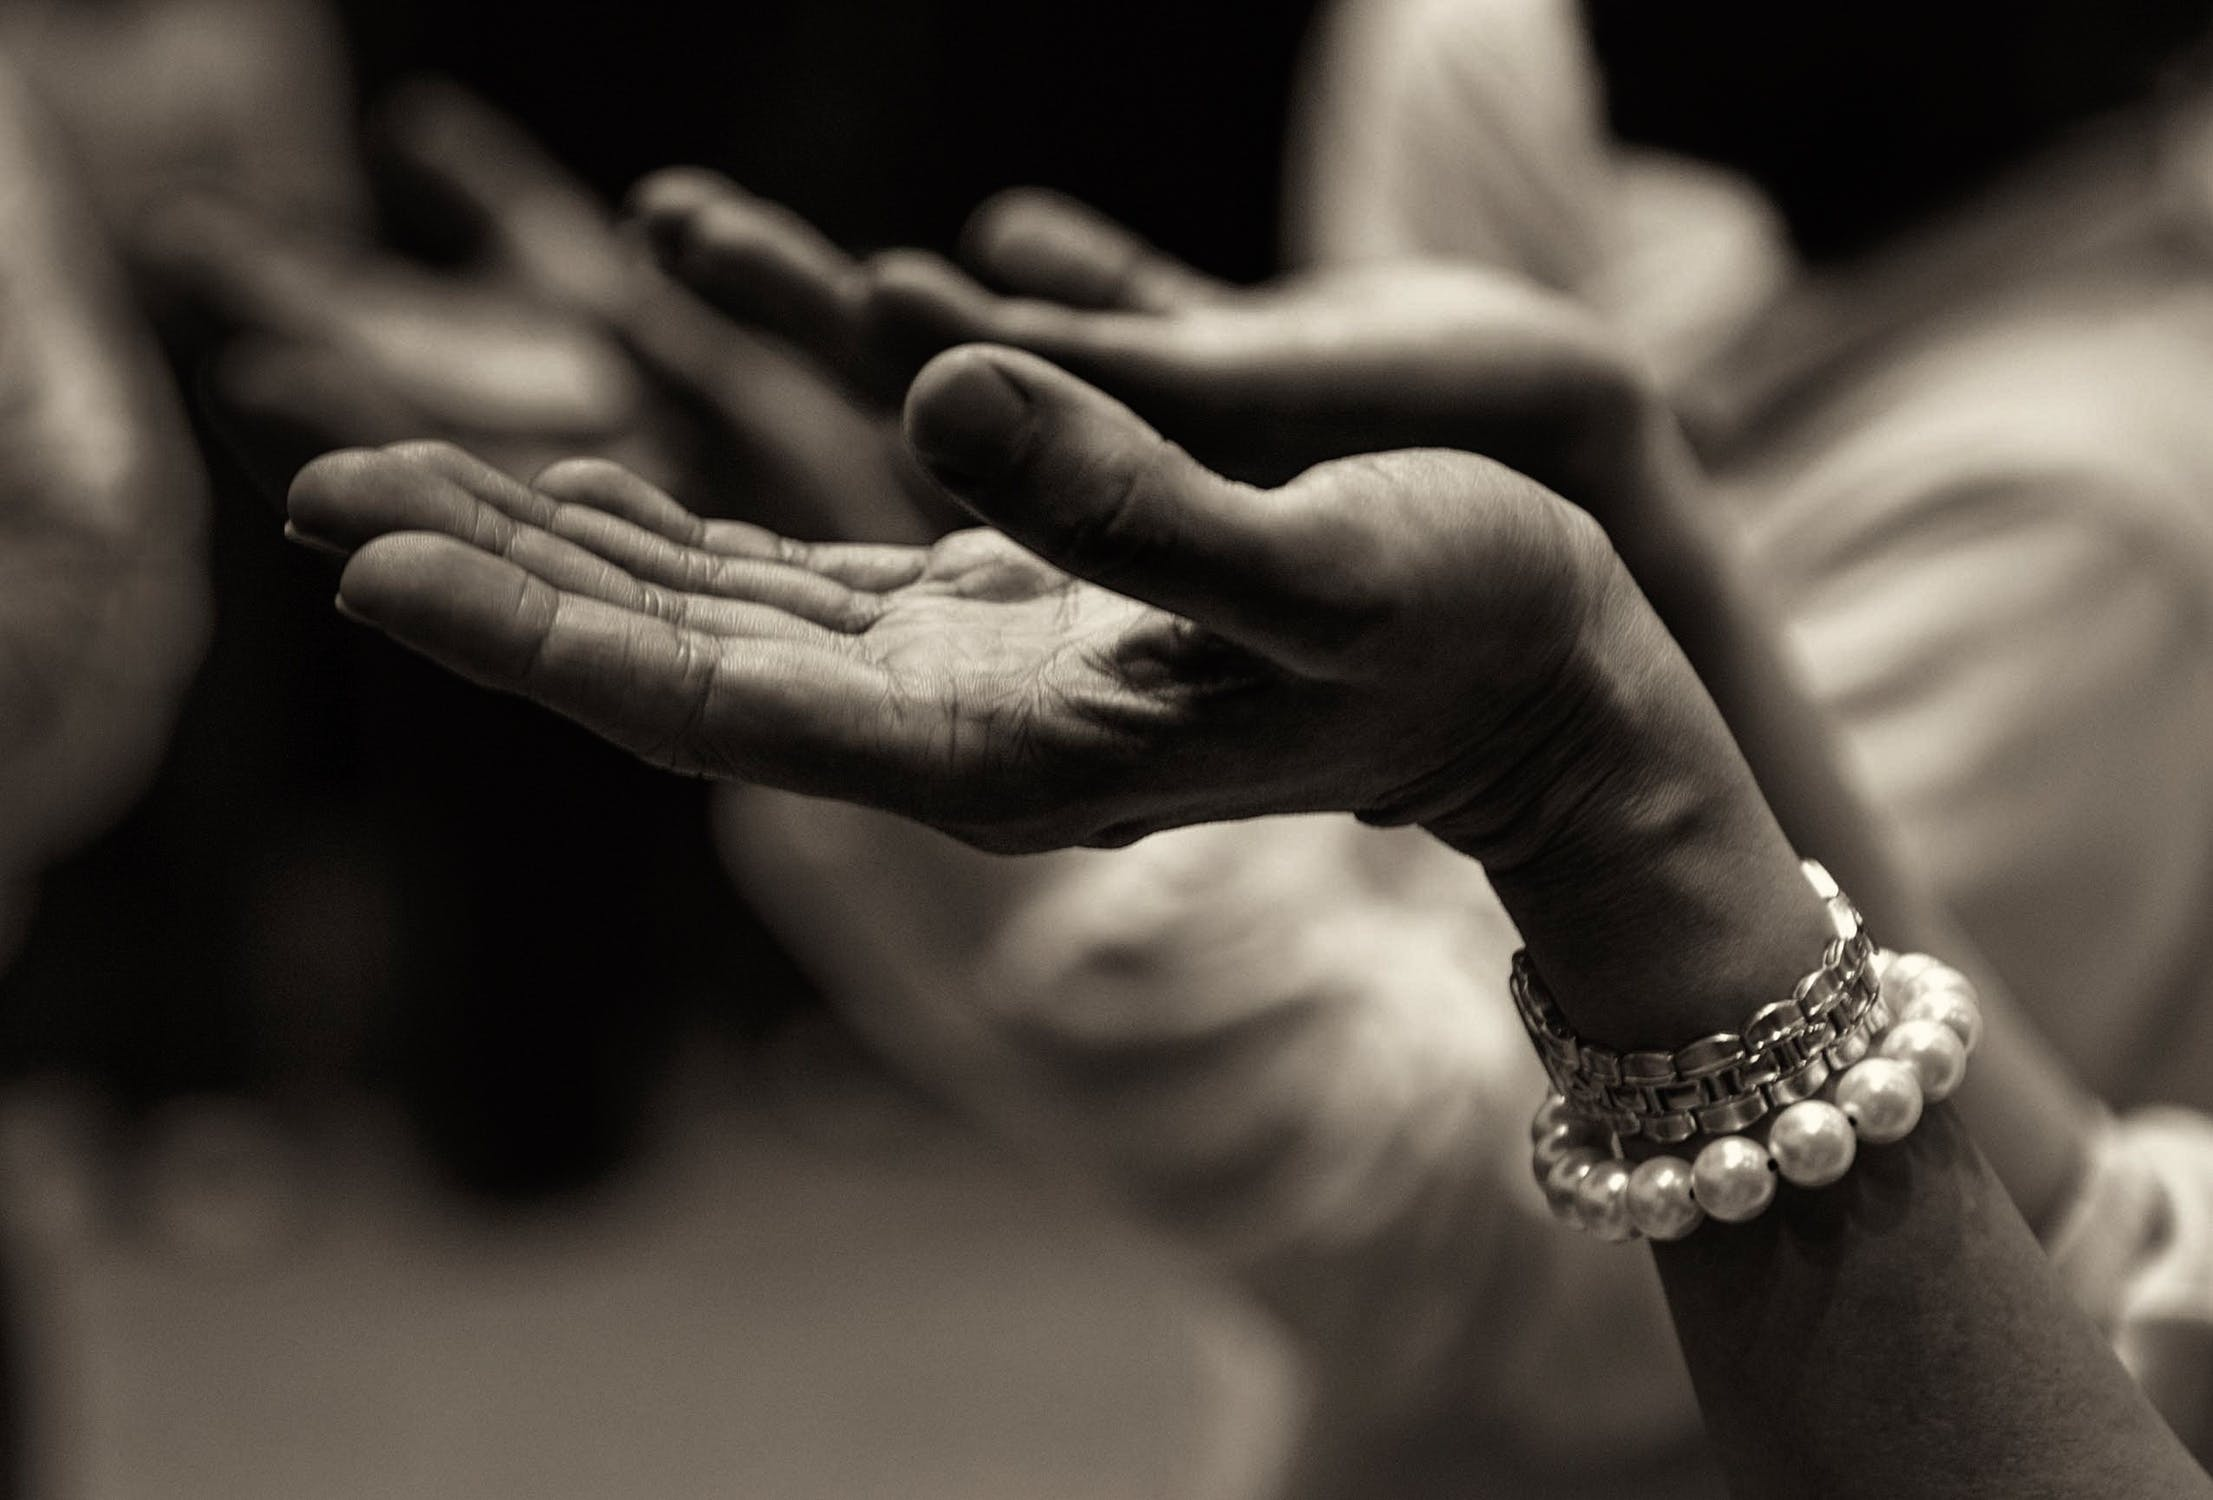 lifting of hands.jpeg